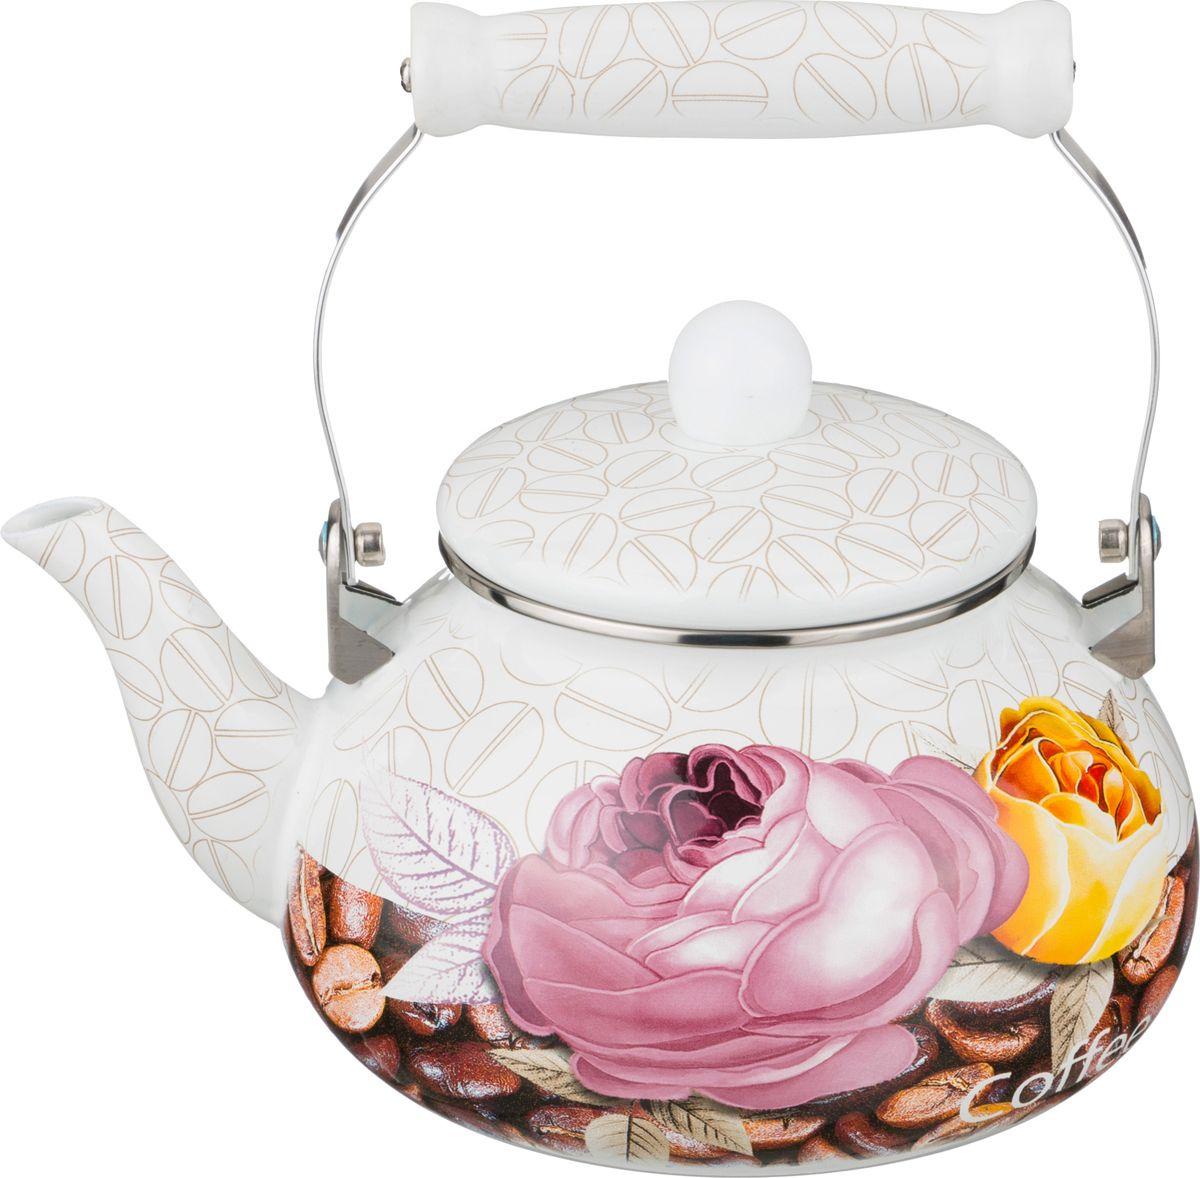 Чайник Agness, 934-342, мультиколор, 2,5 л чайник agness 934 316 мультиколор 4 л